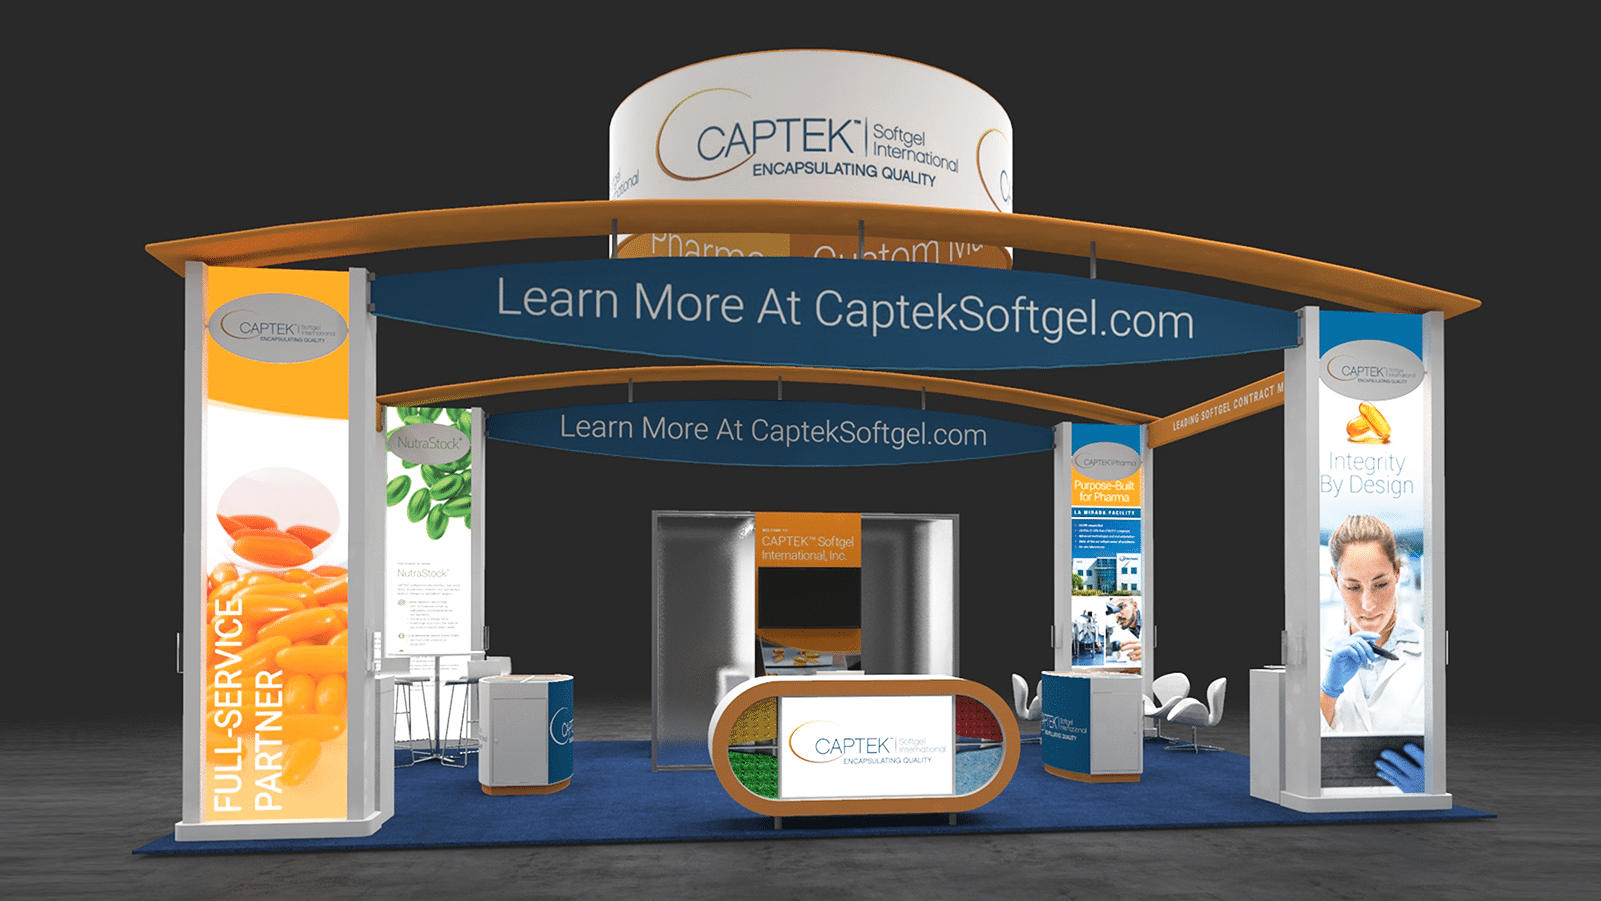 captek trade show booth design